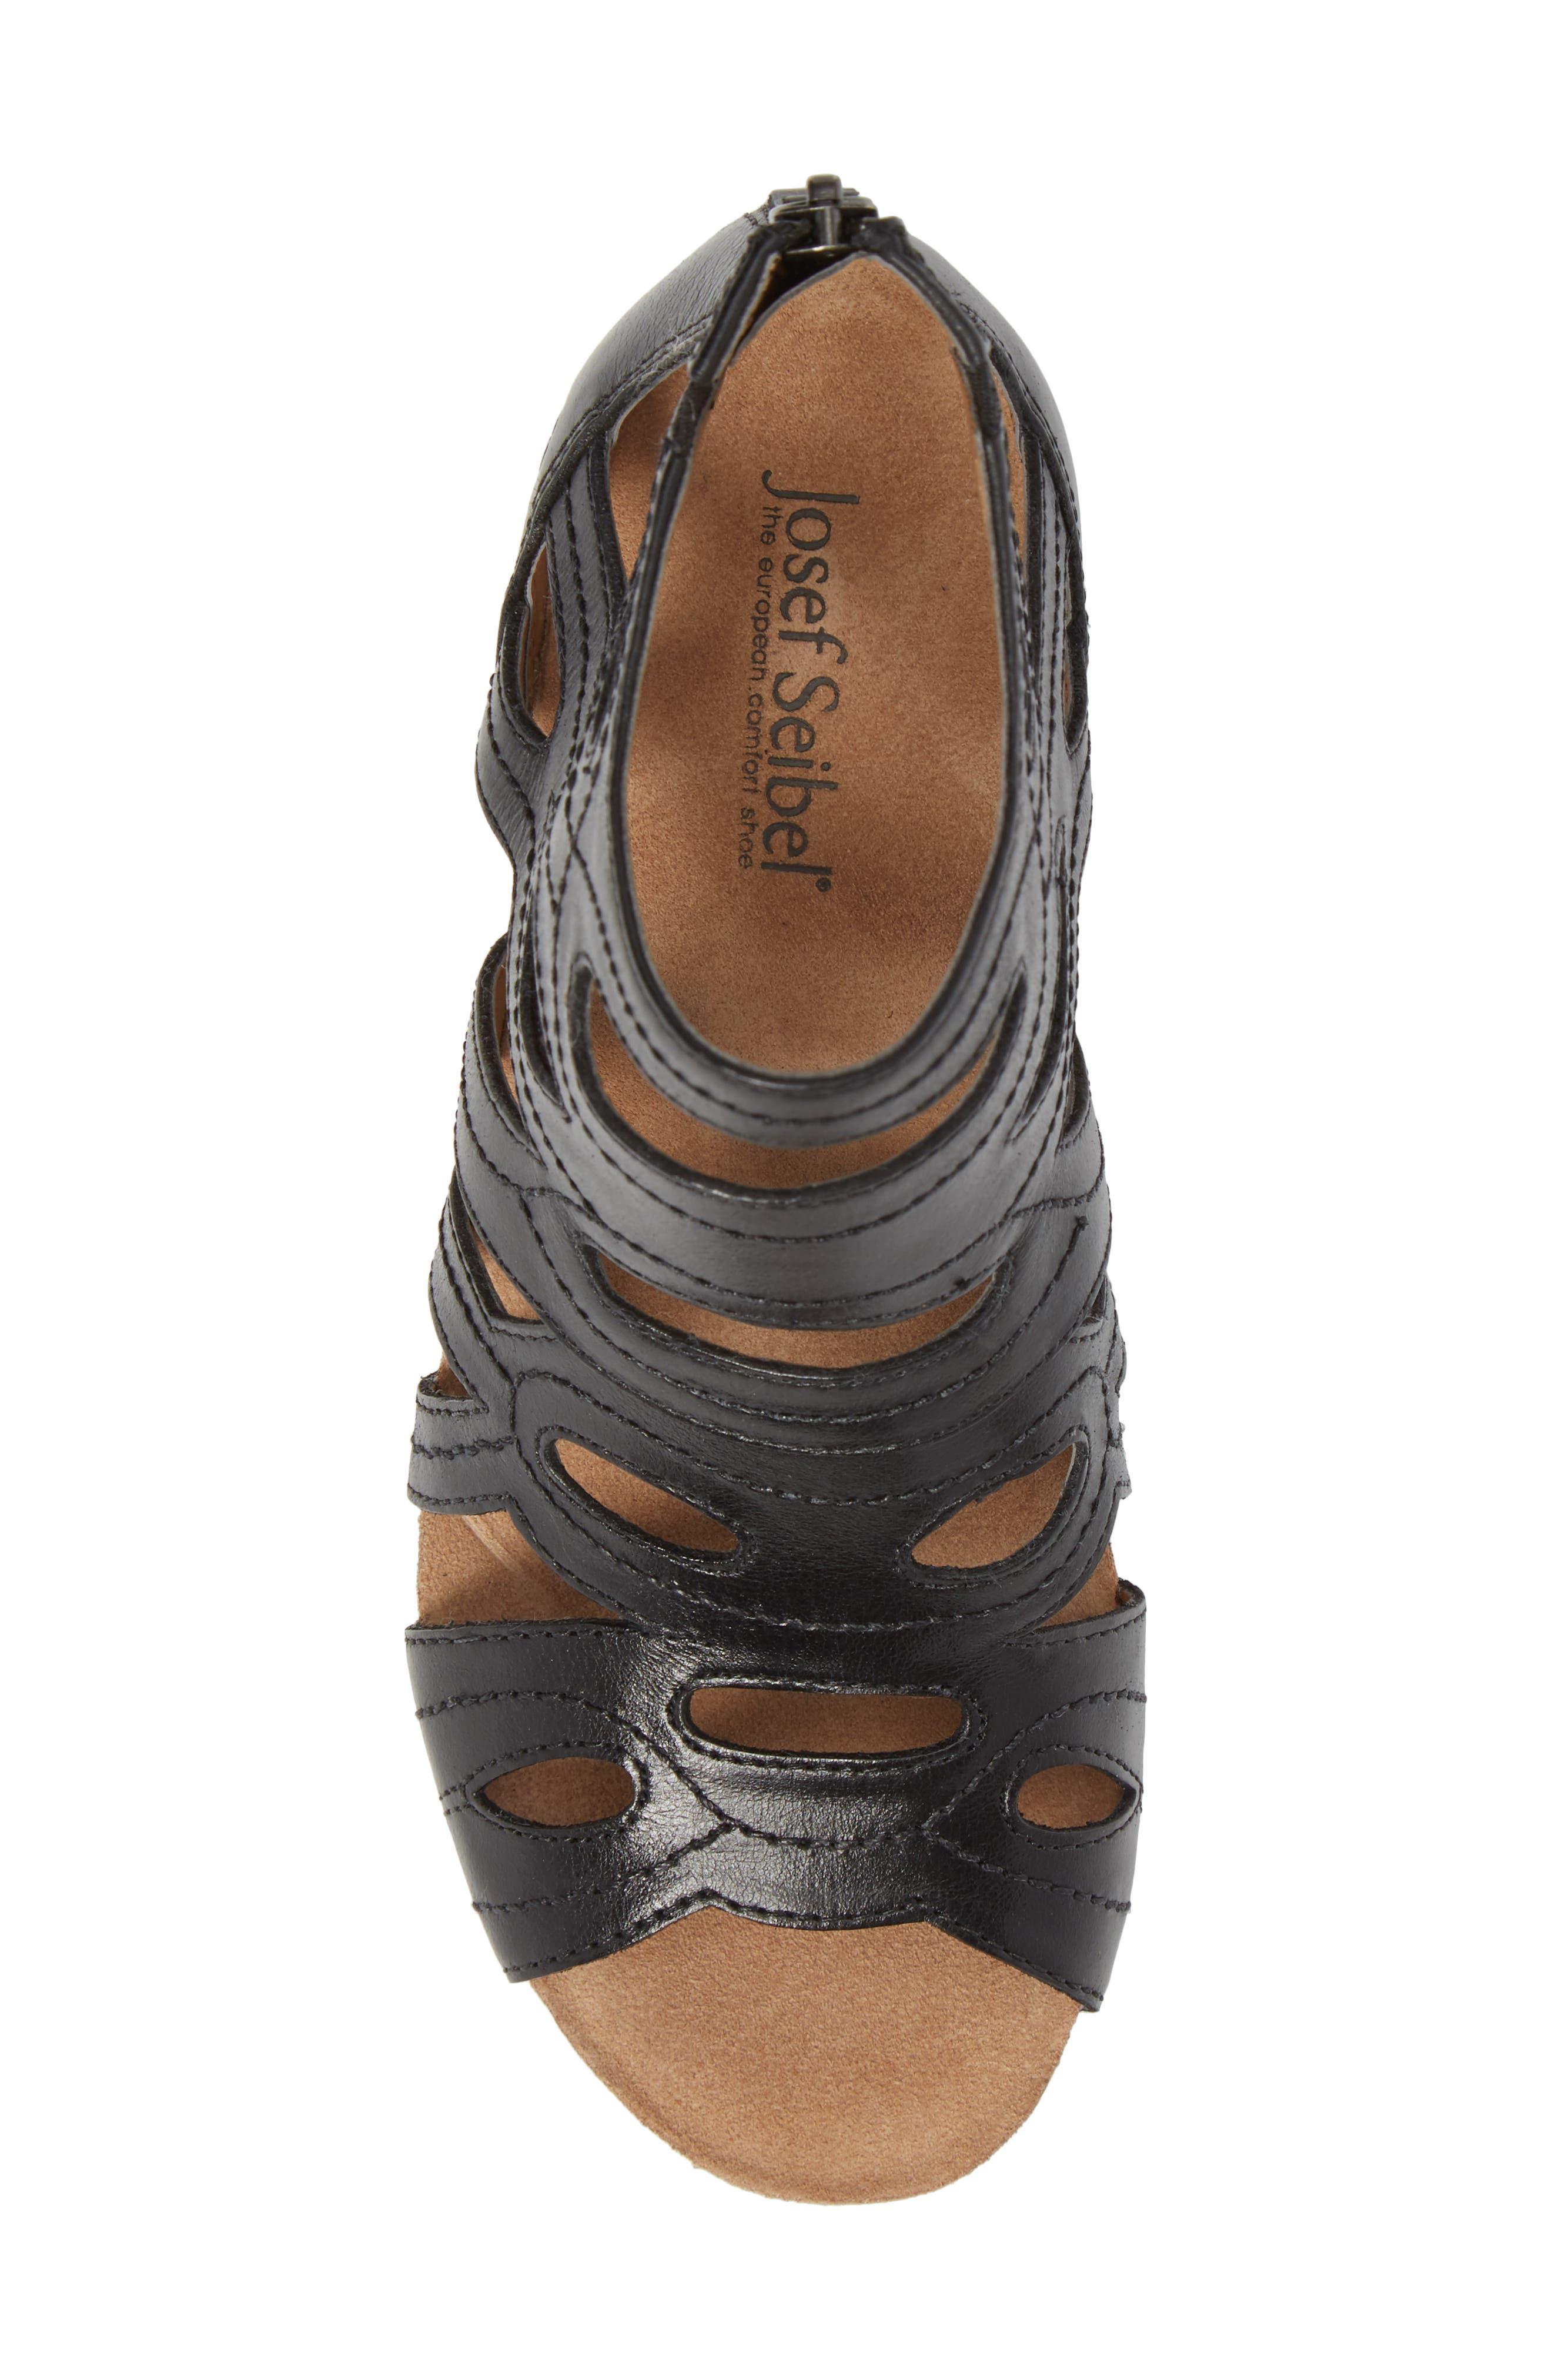 Rose 21 Gladiator Sandal,                             Alternate thumbnail 5, color,                             BLACK LEATHER